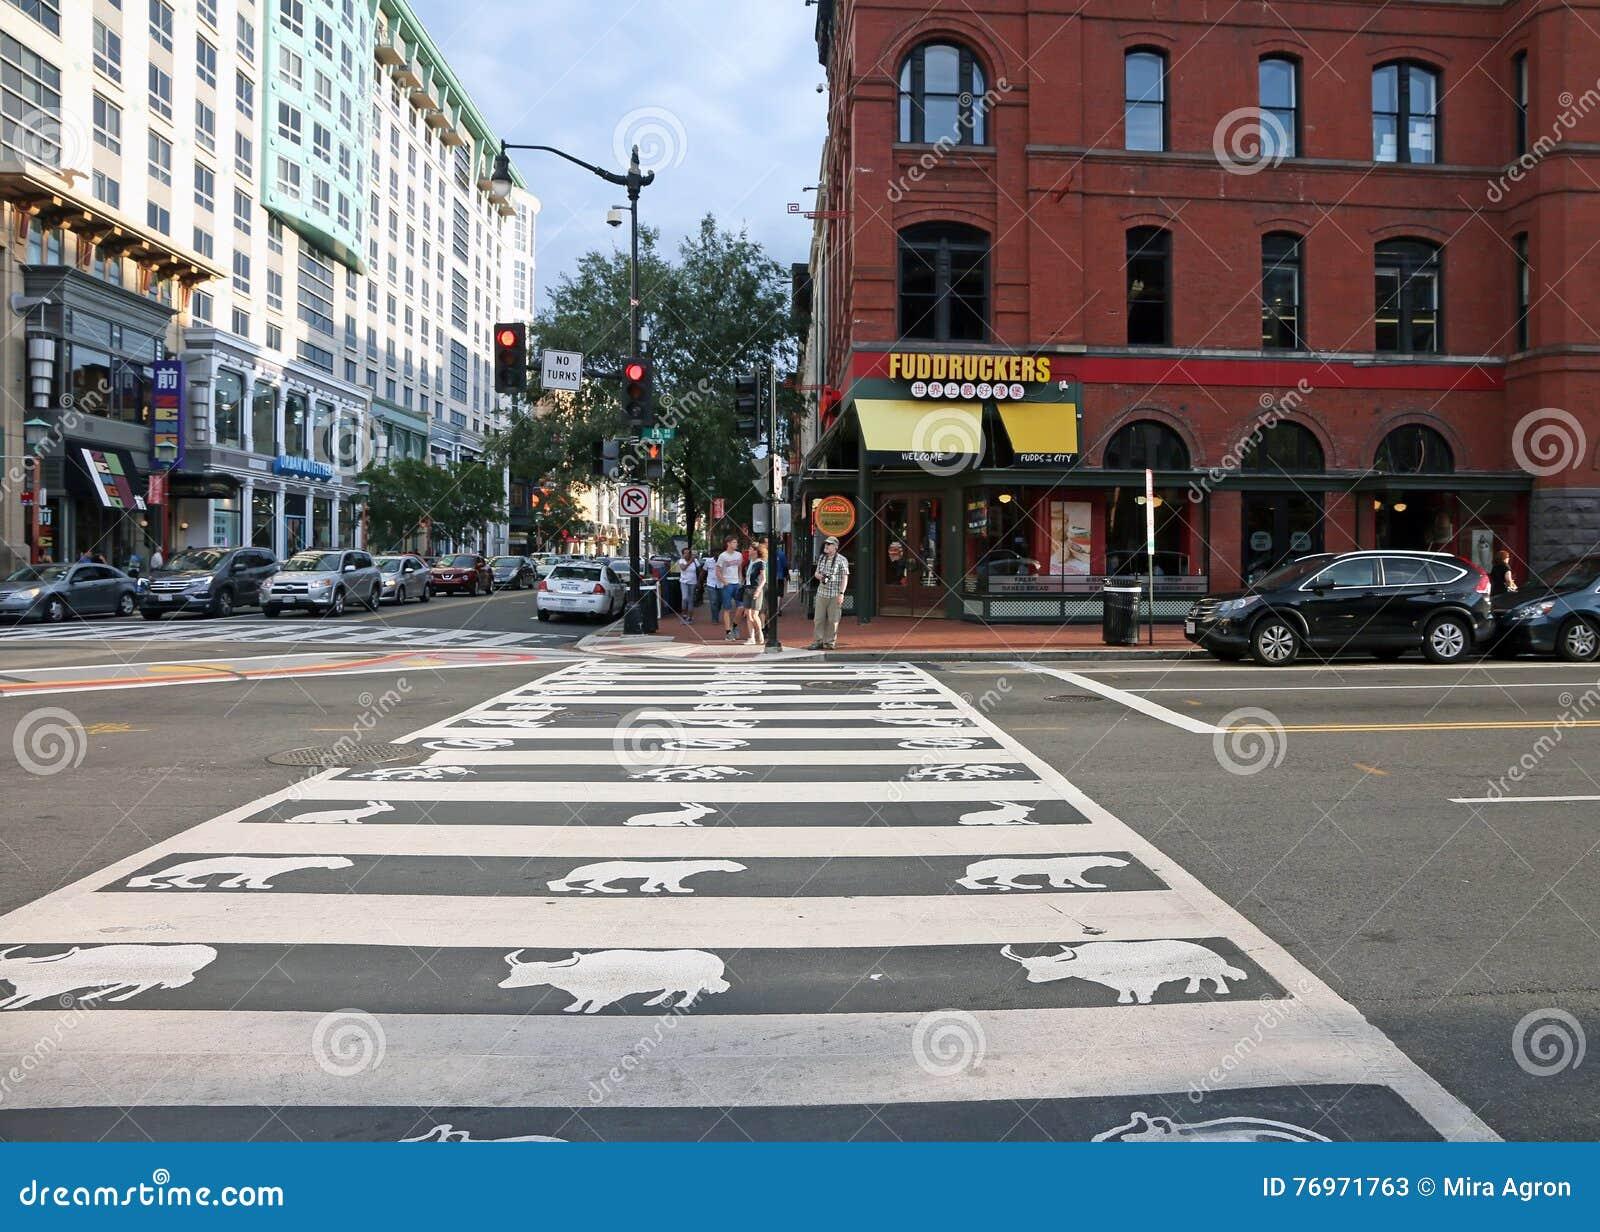 Crosswalk with zodiac symbols In Chinatown